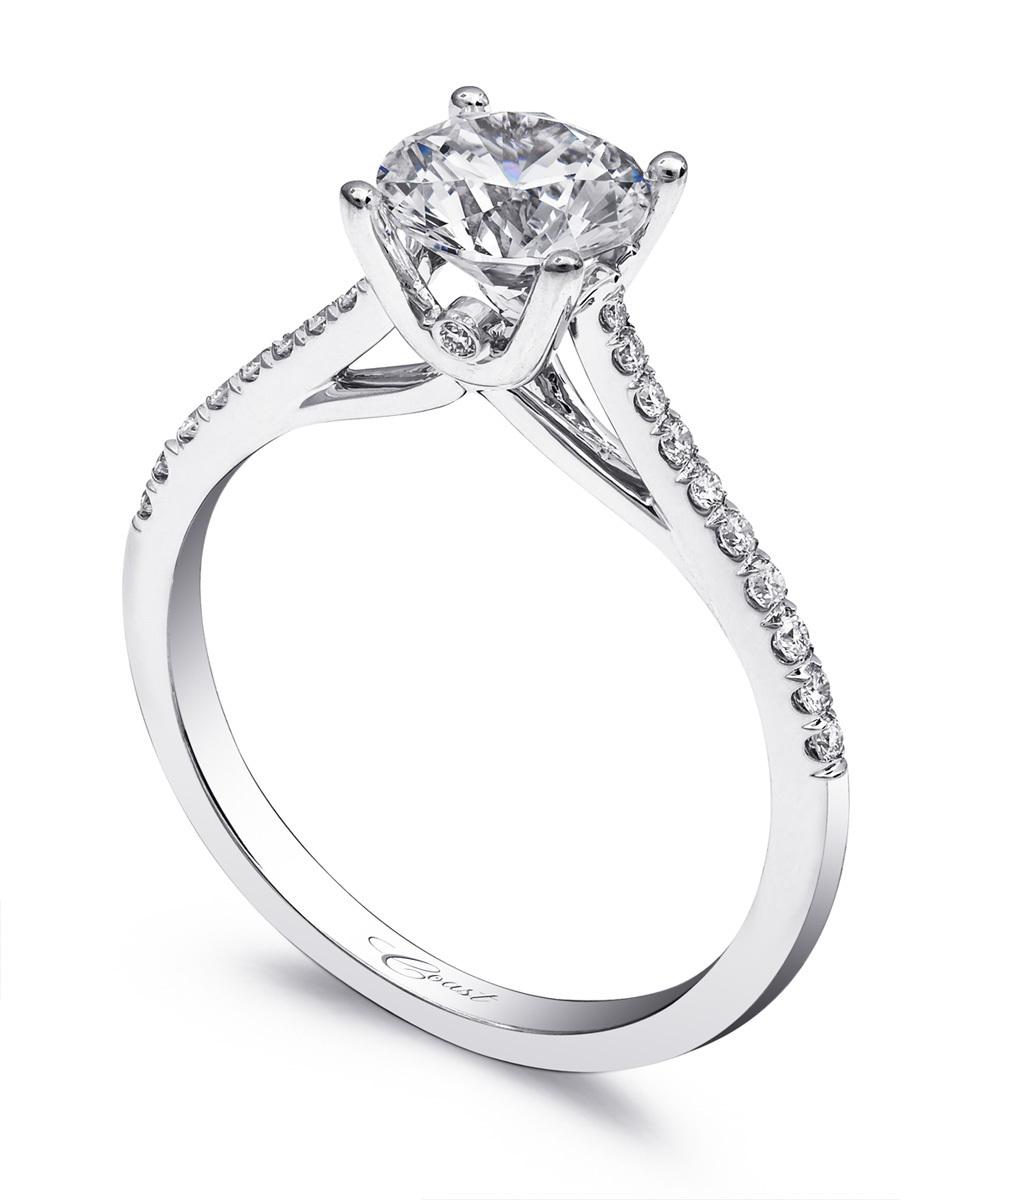 Charisma Engagement Ring - Classic, Petite Diamonds